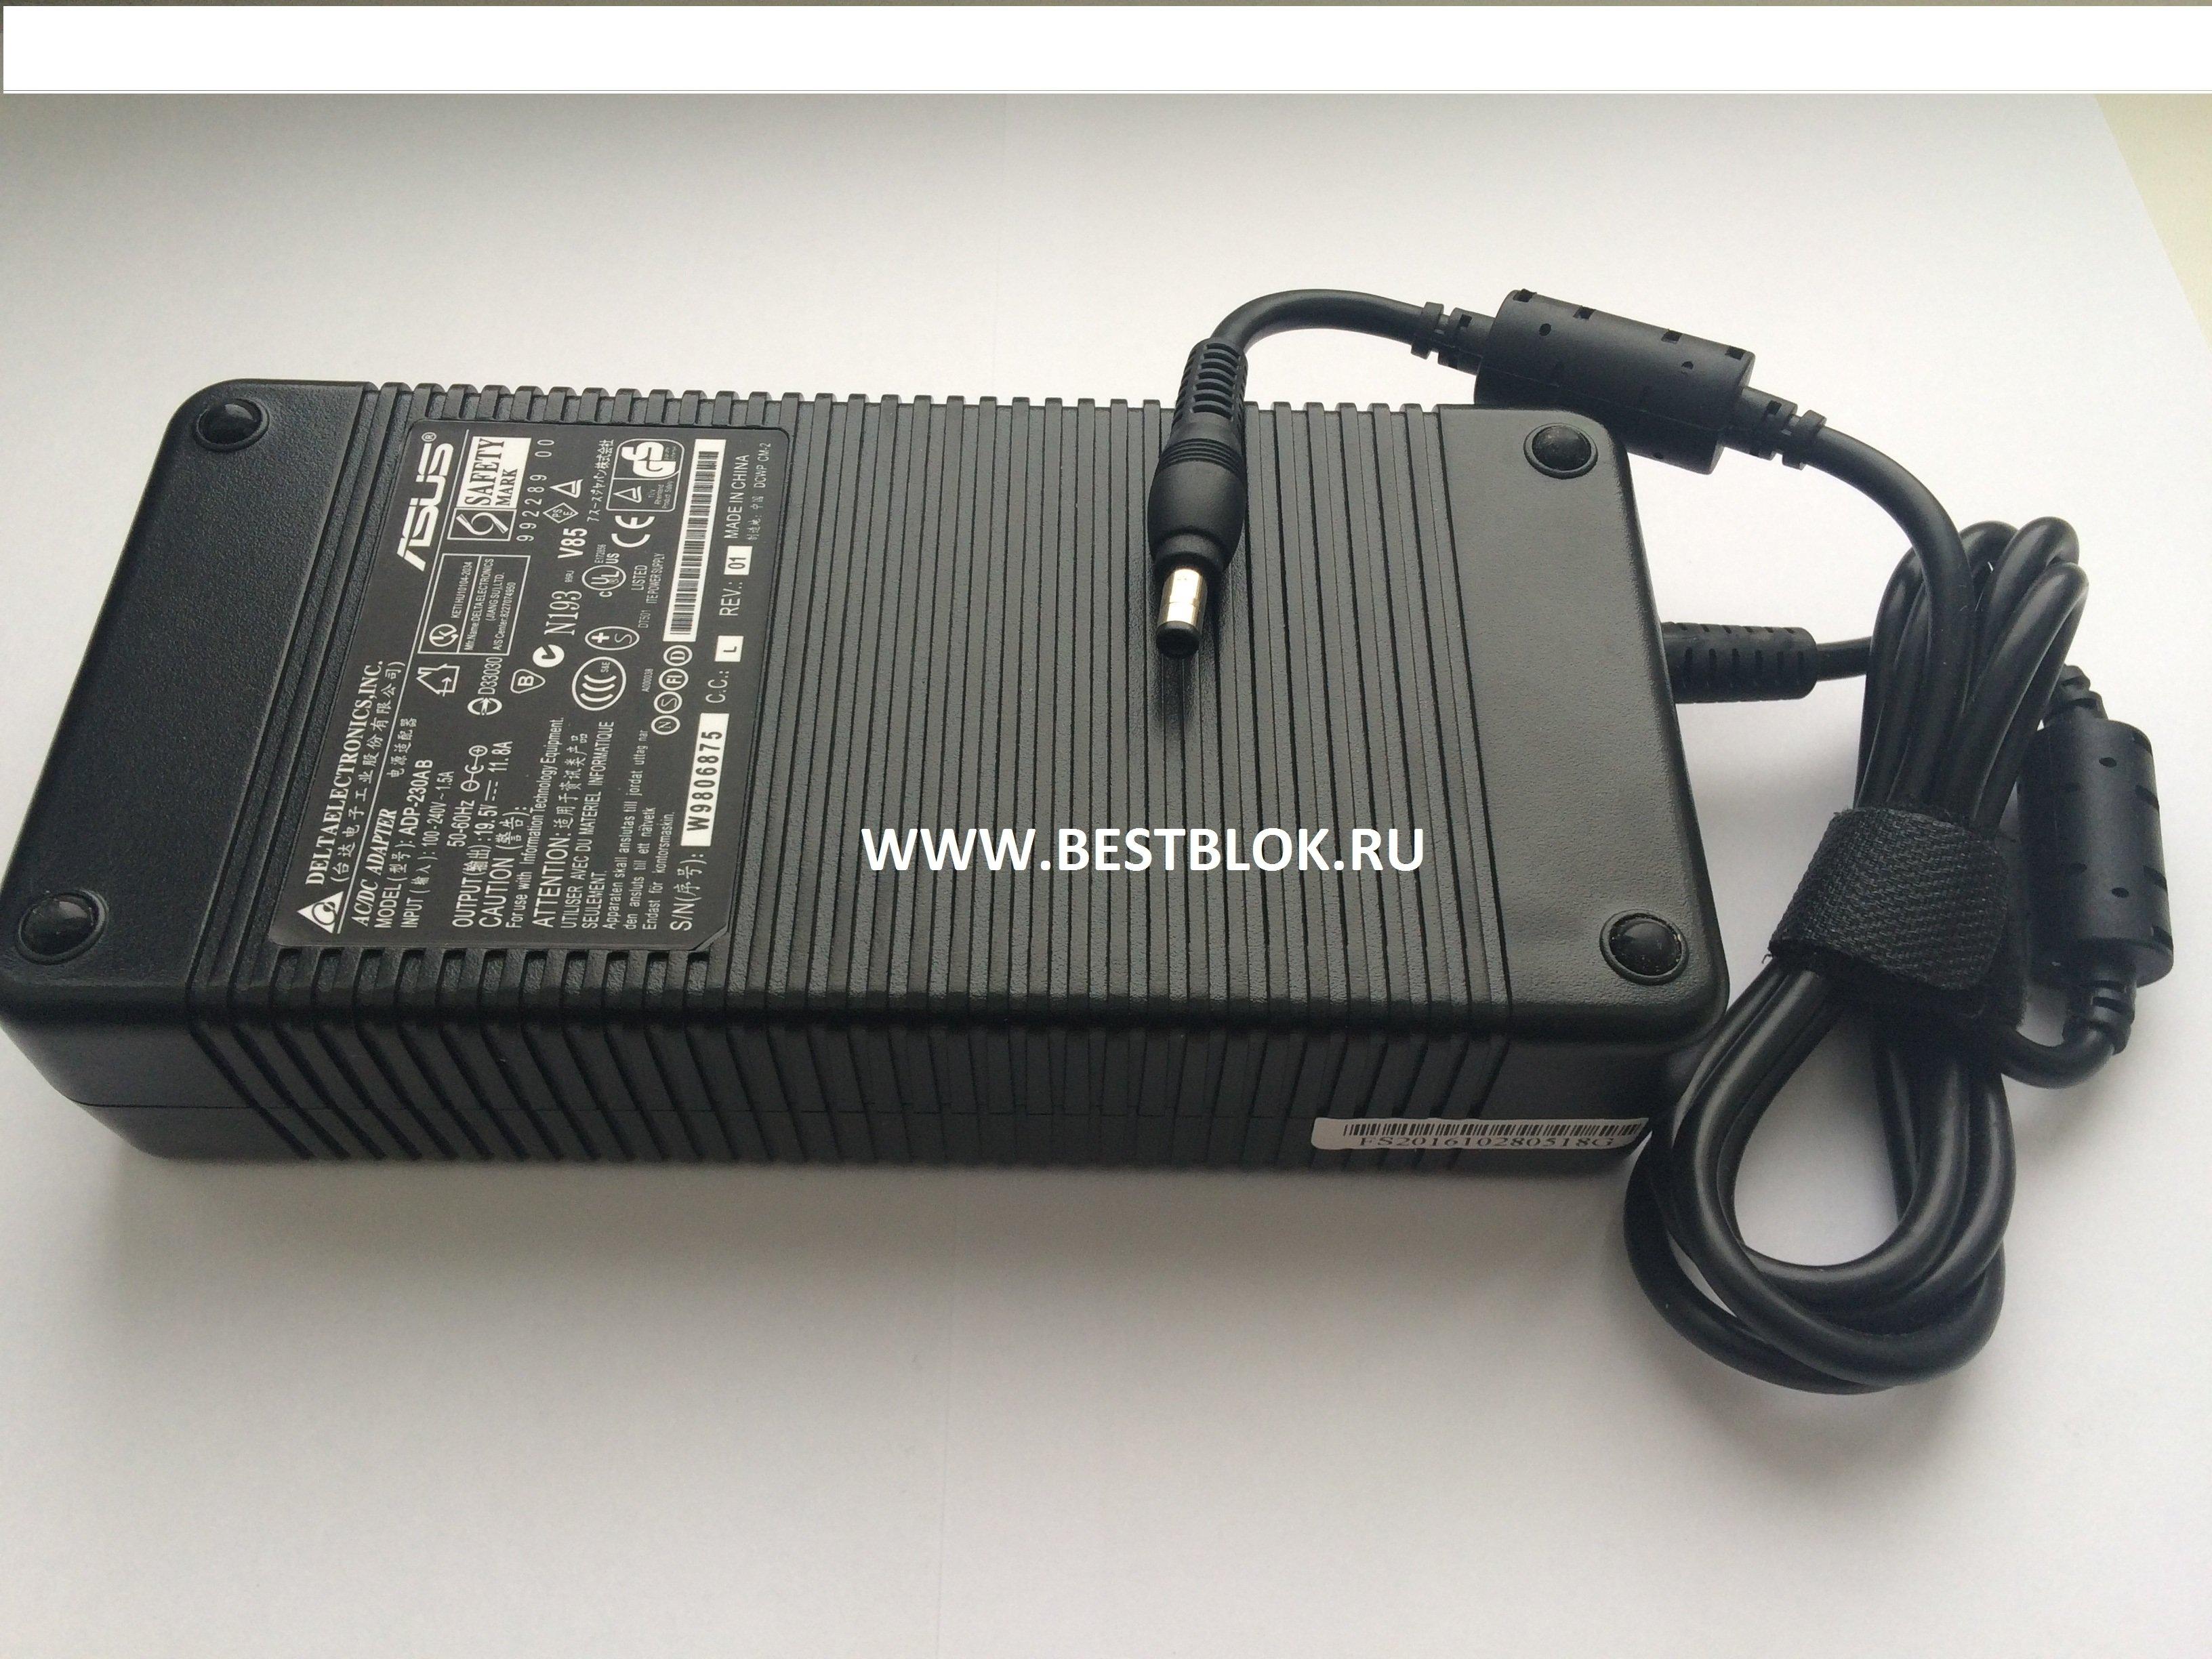 Адаптер блок питания для ноутбука (моноблока) ASUS GL502VS GL502V MSI GT72 2PC Dominator HP 19.5V-11.8A 230W (5,5*2,5 mm)